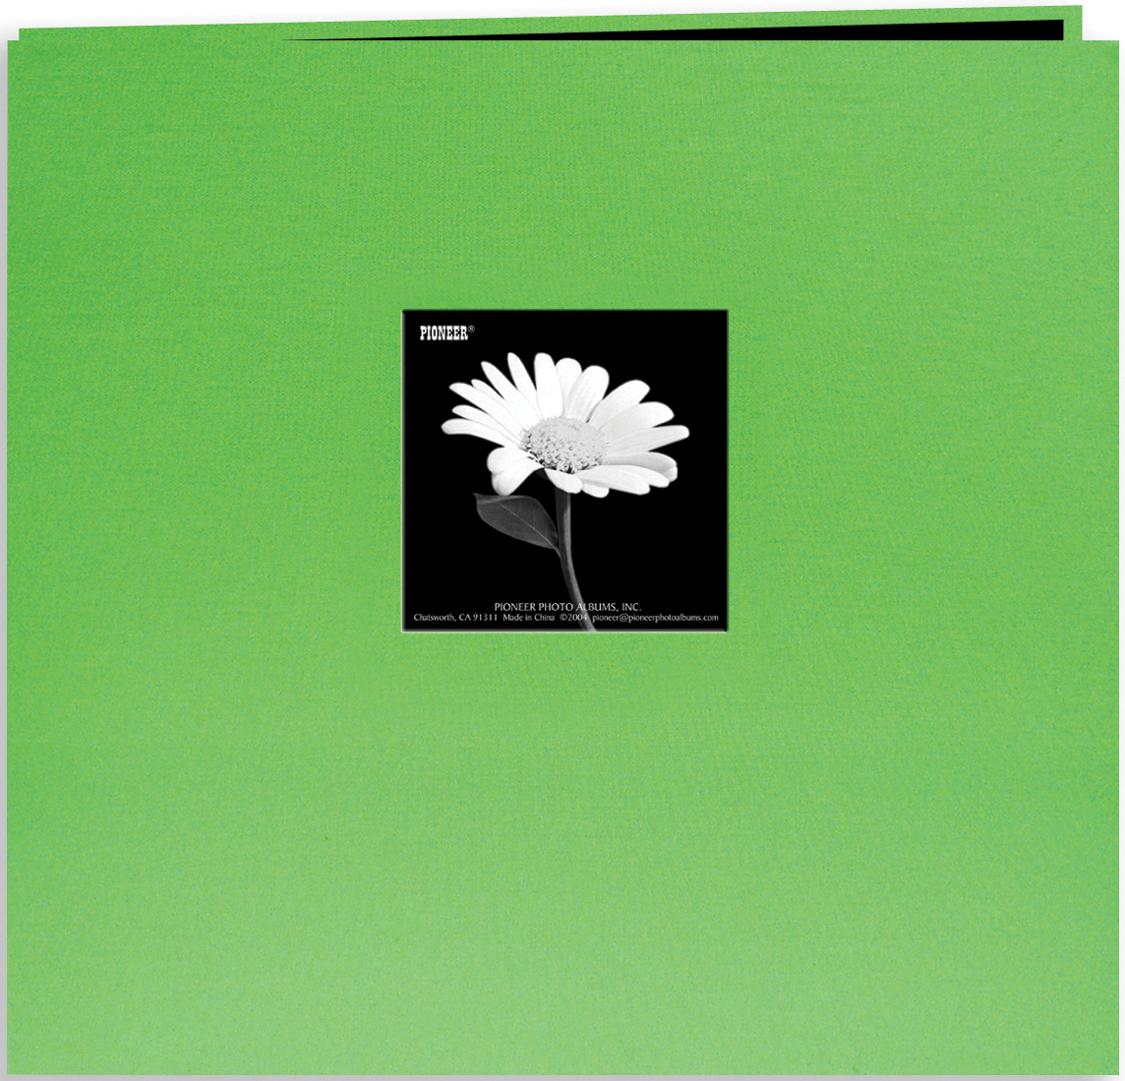 Pioneer Book Cloth Cover Post Bound Album 8X8-Citrus Green